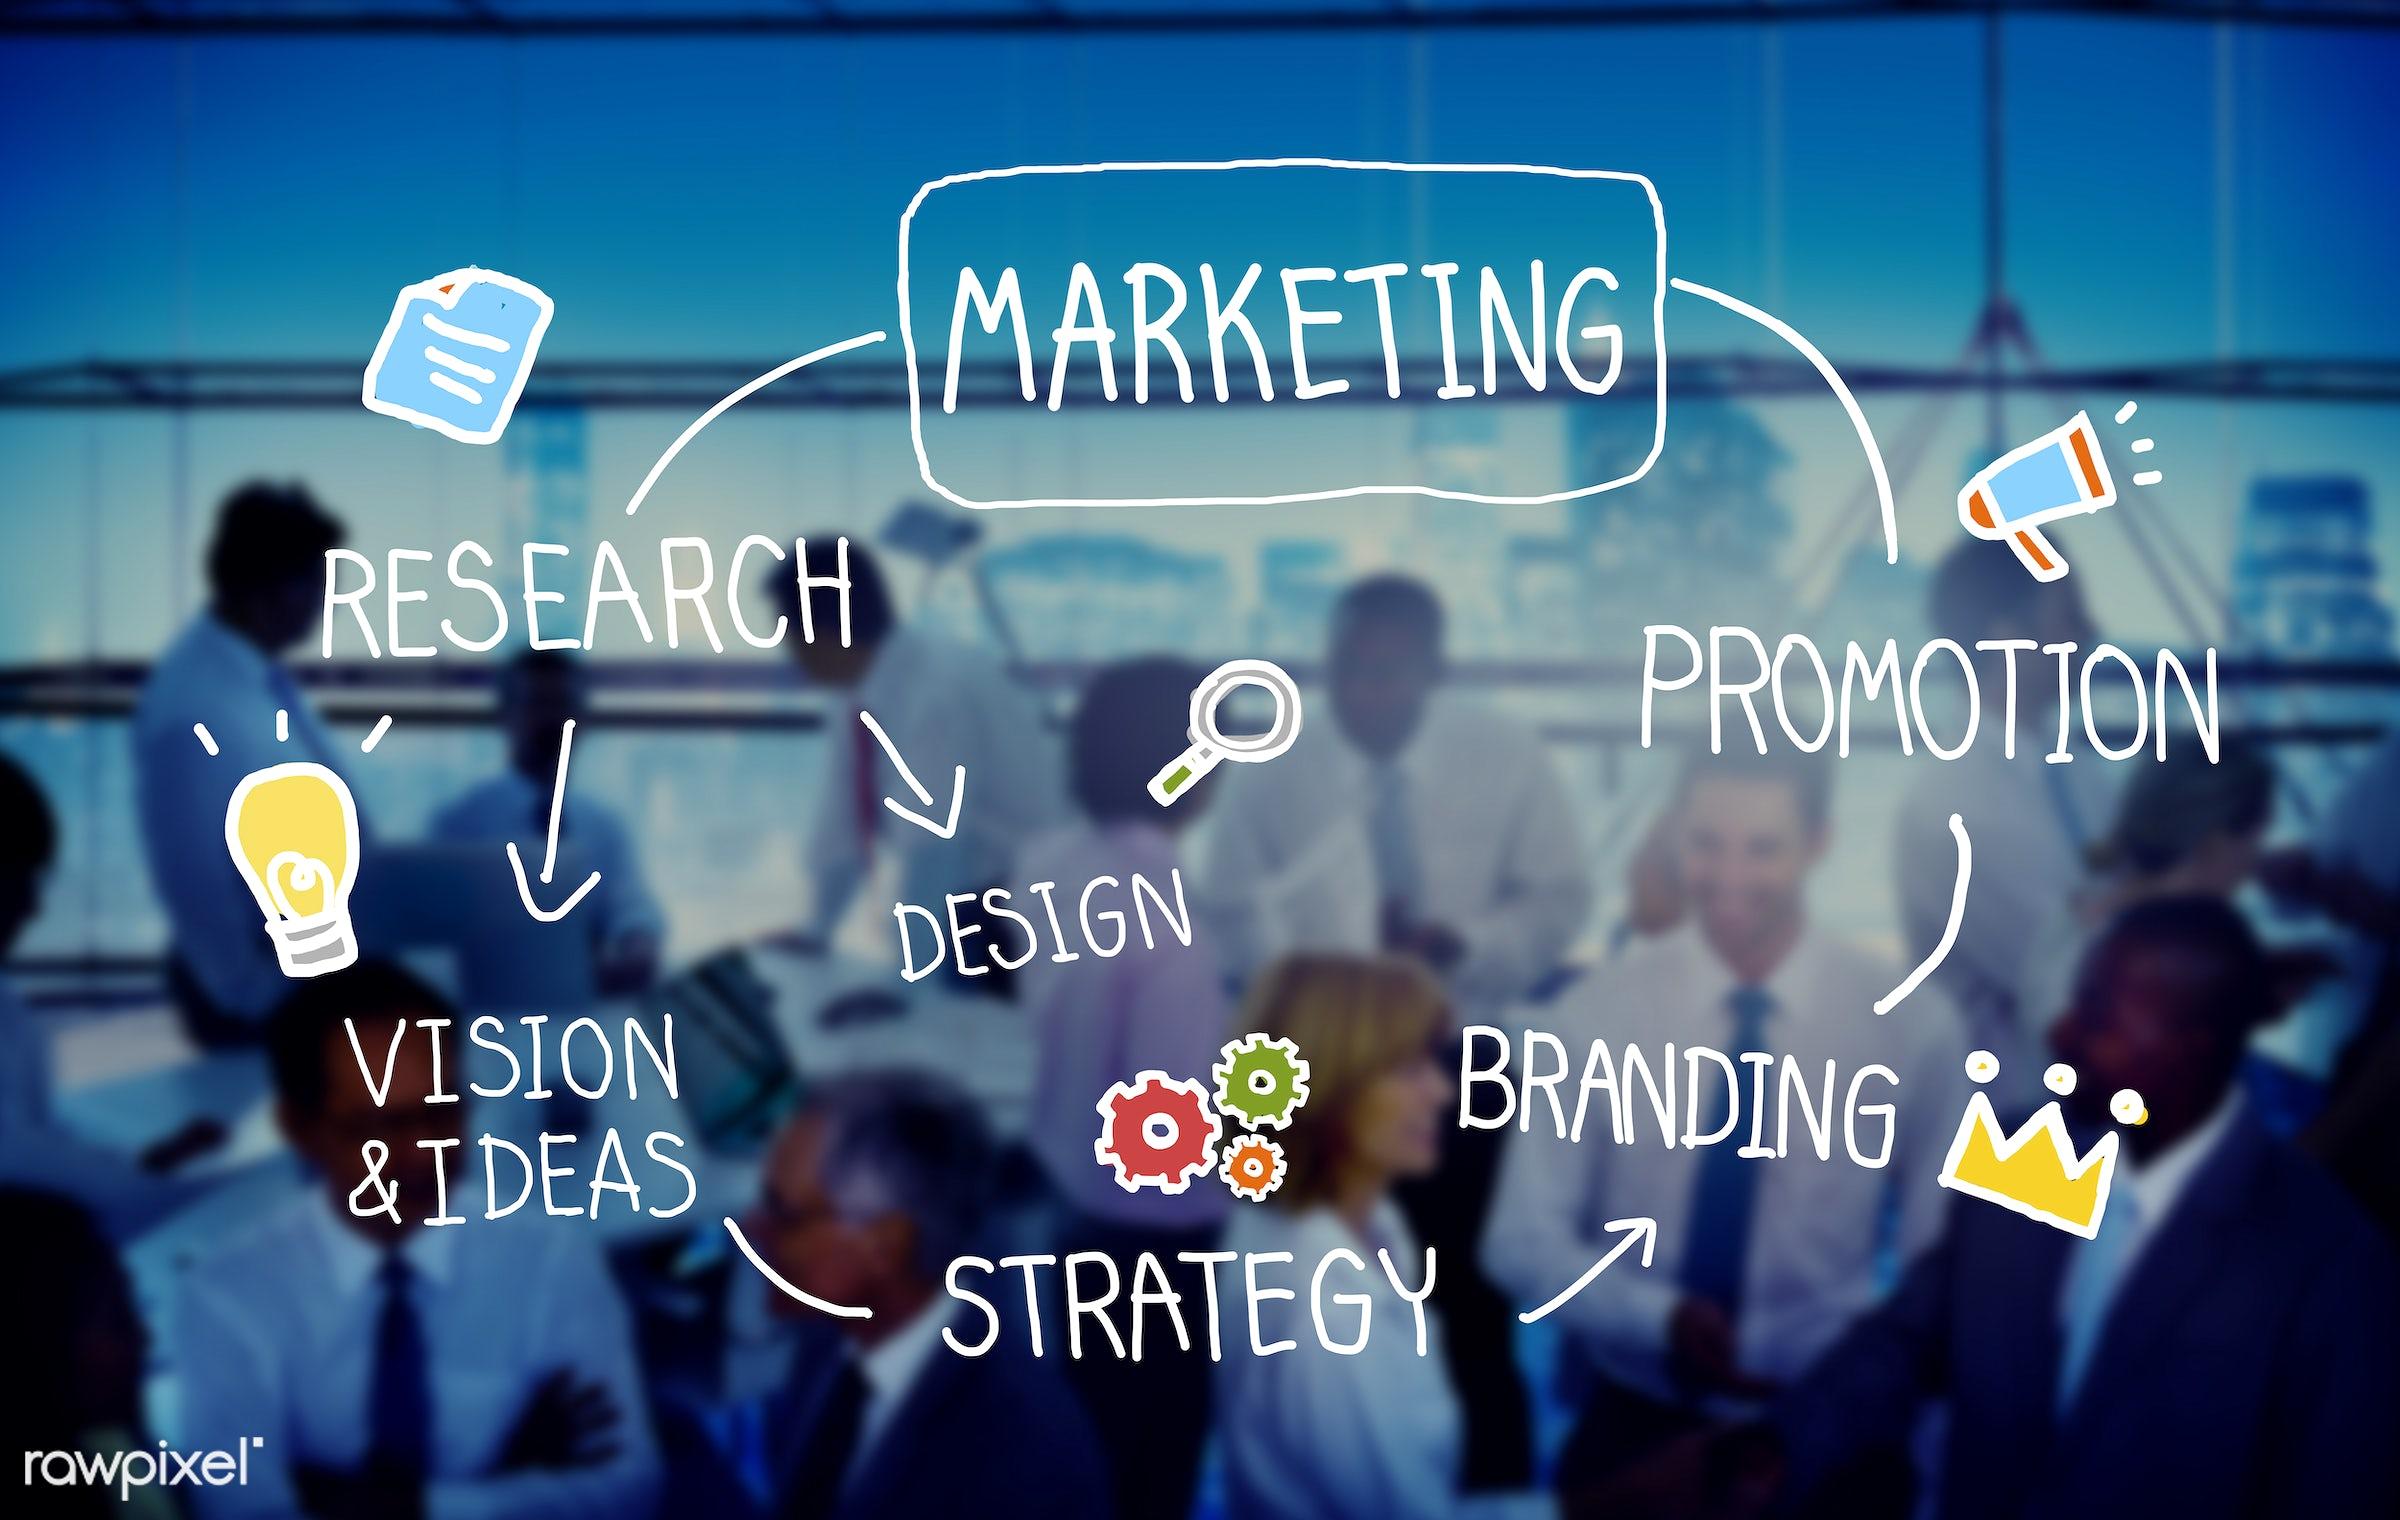 advertising, african descent, analysis, analyzing, asian ethnicity, branding, building, business, businessmen, businesswomen...